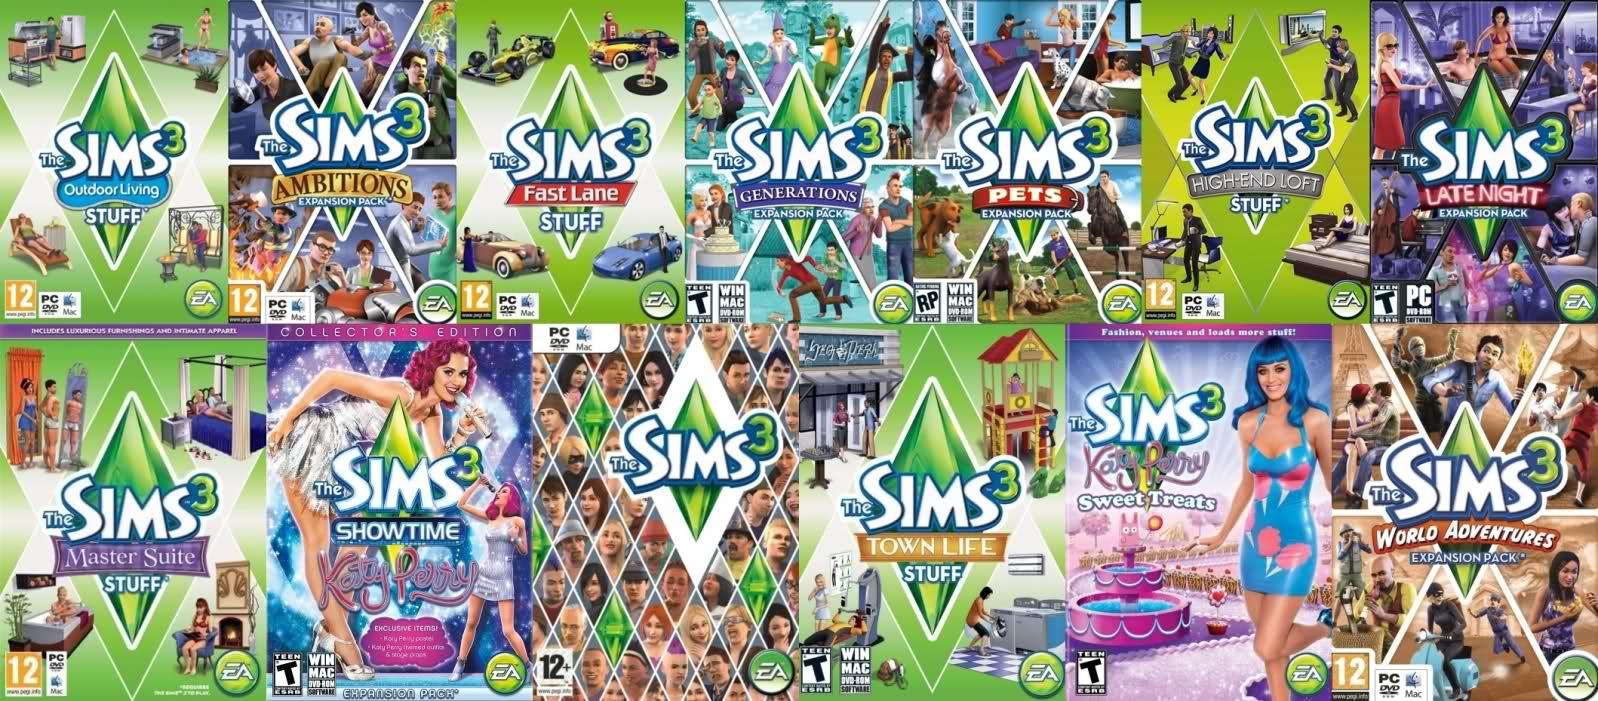 Kali Ini Saya Akan Membahas Mengenai Expantion Expantion Dan Stuff Stuff Yang Ada Di The Sims  Sebelumnya Saya Ingin Menjelaskan Secara Singkat Apa Itu